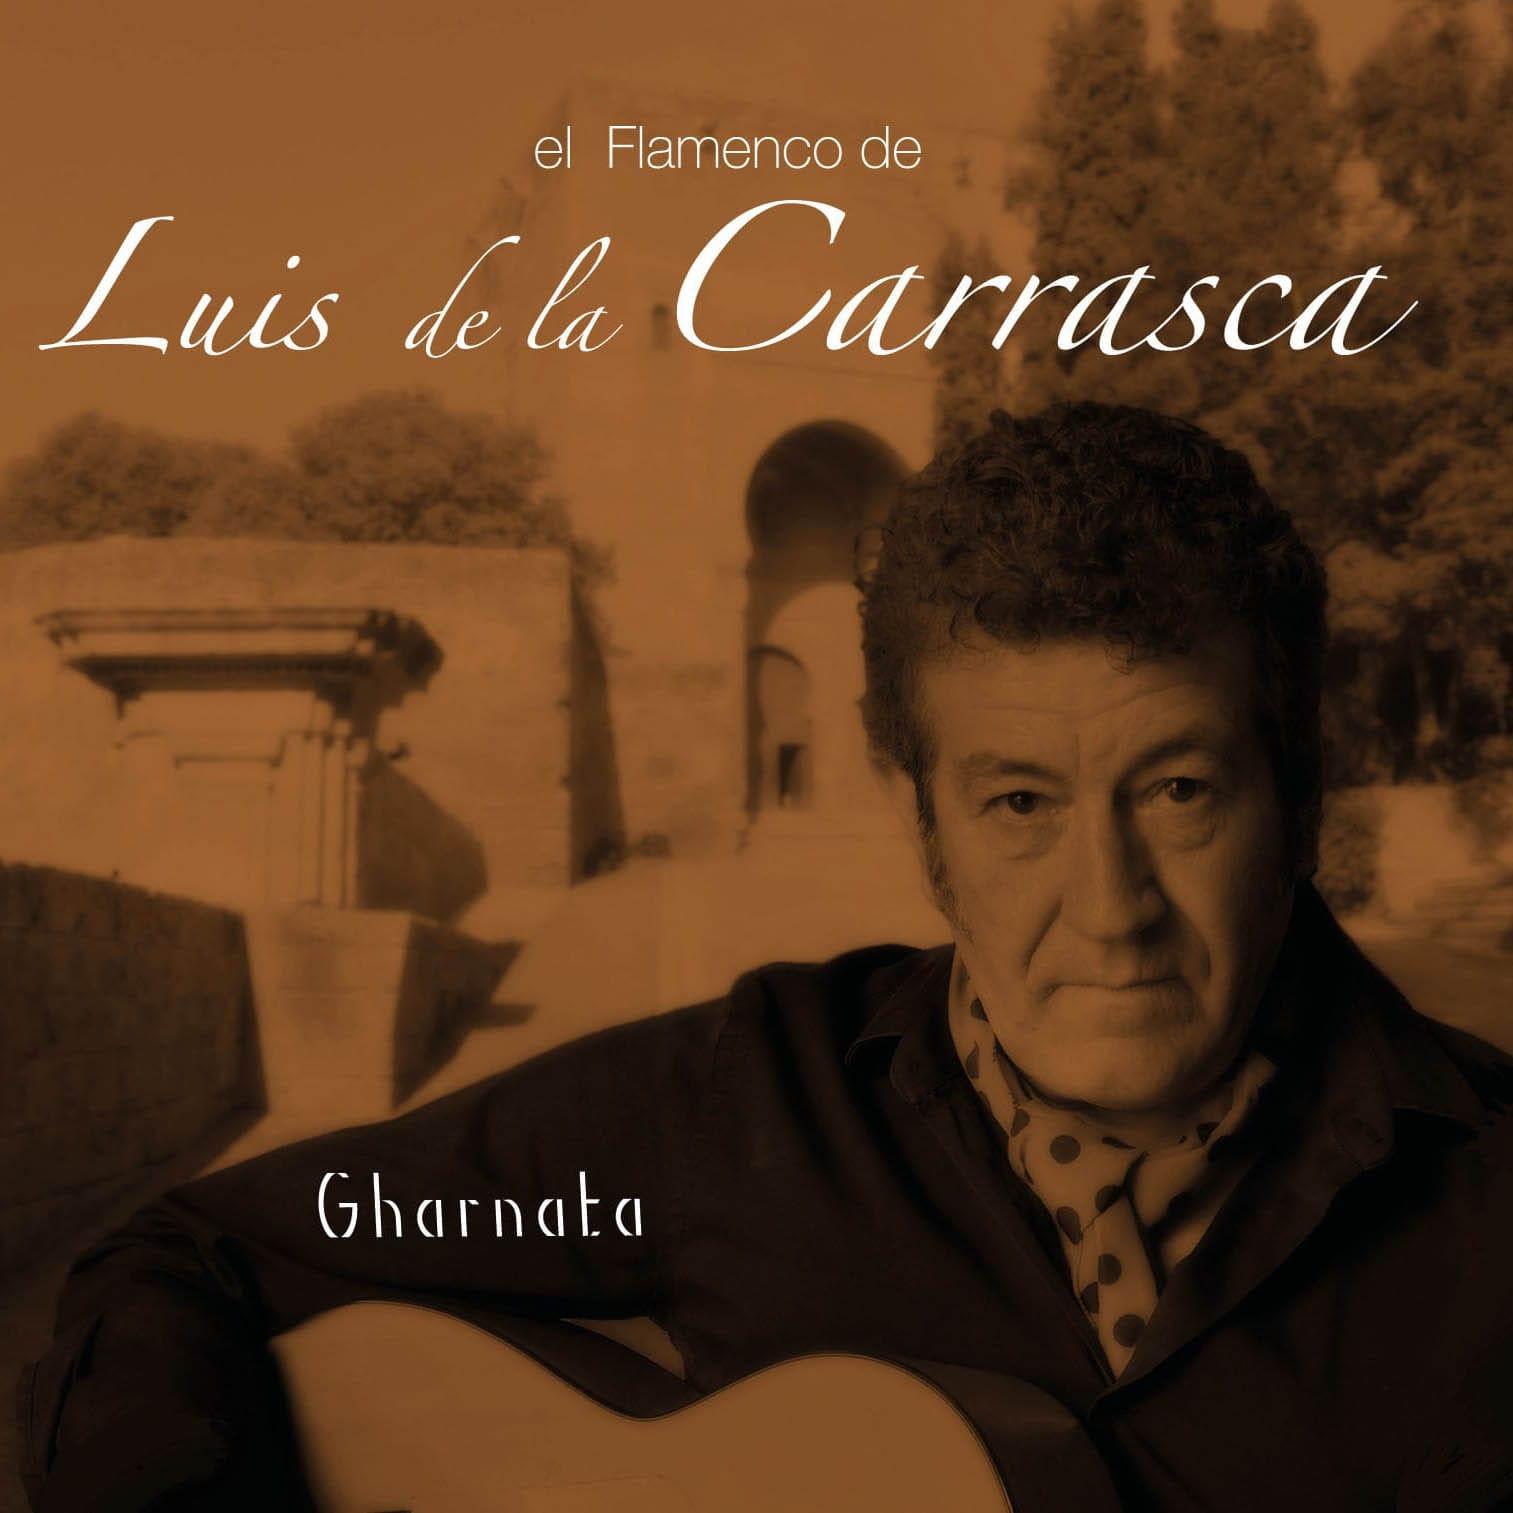 Luis de la Carrasca - Gharnata